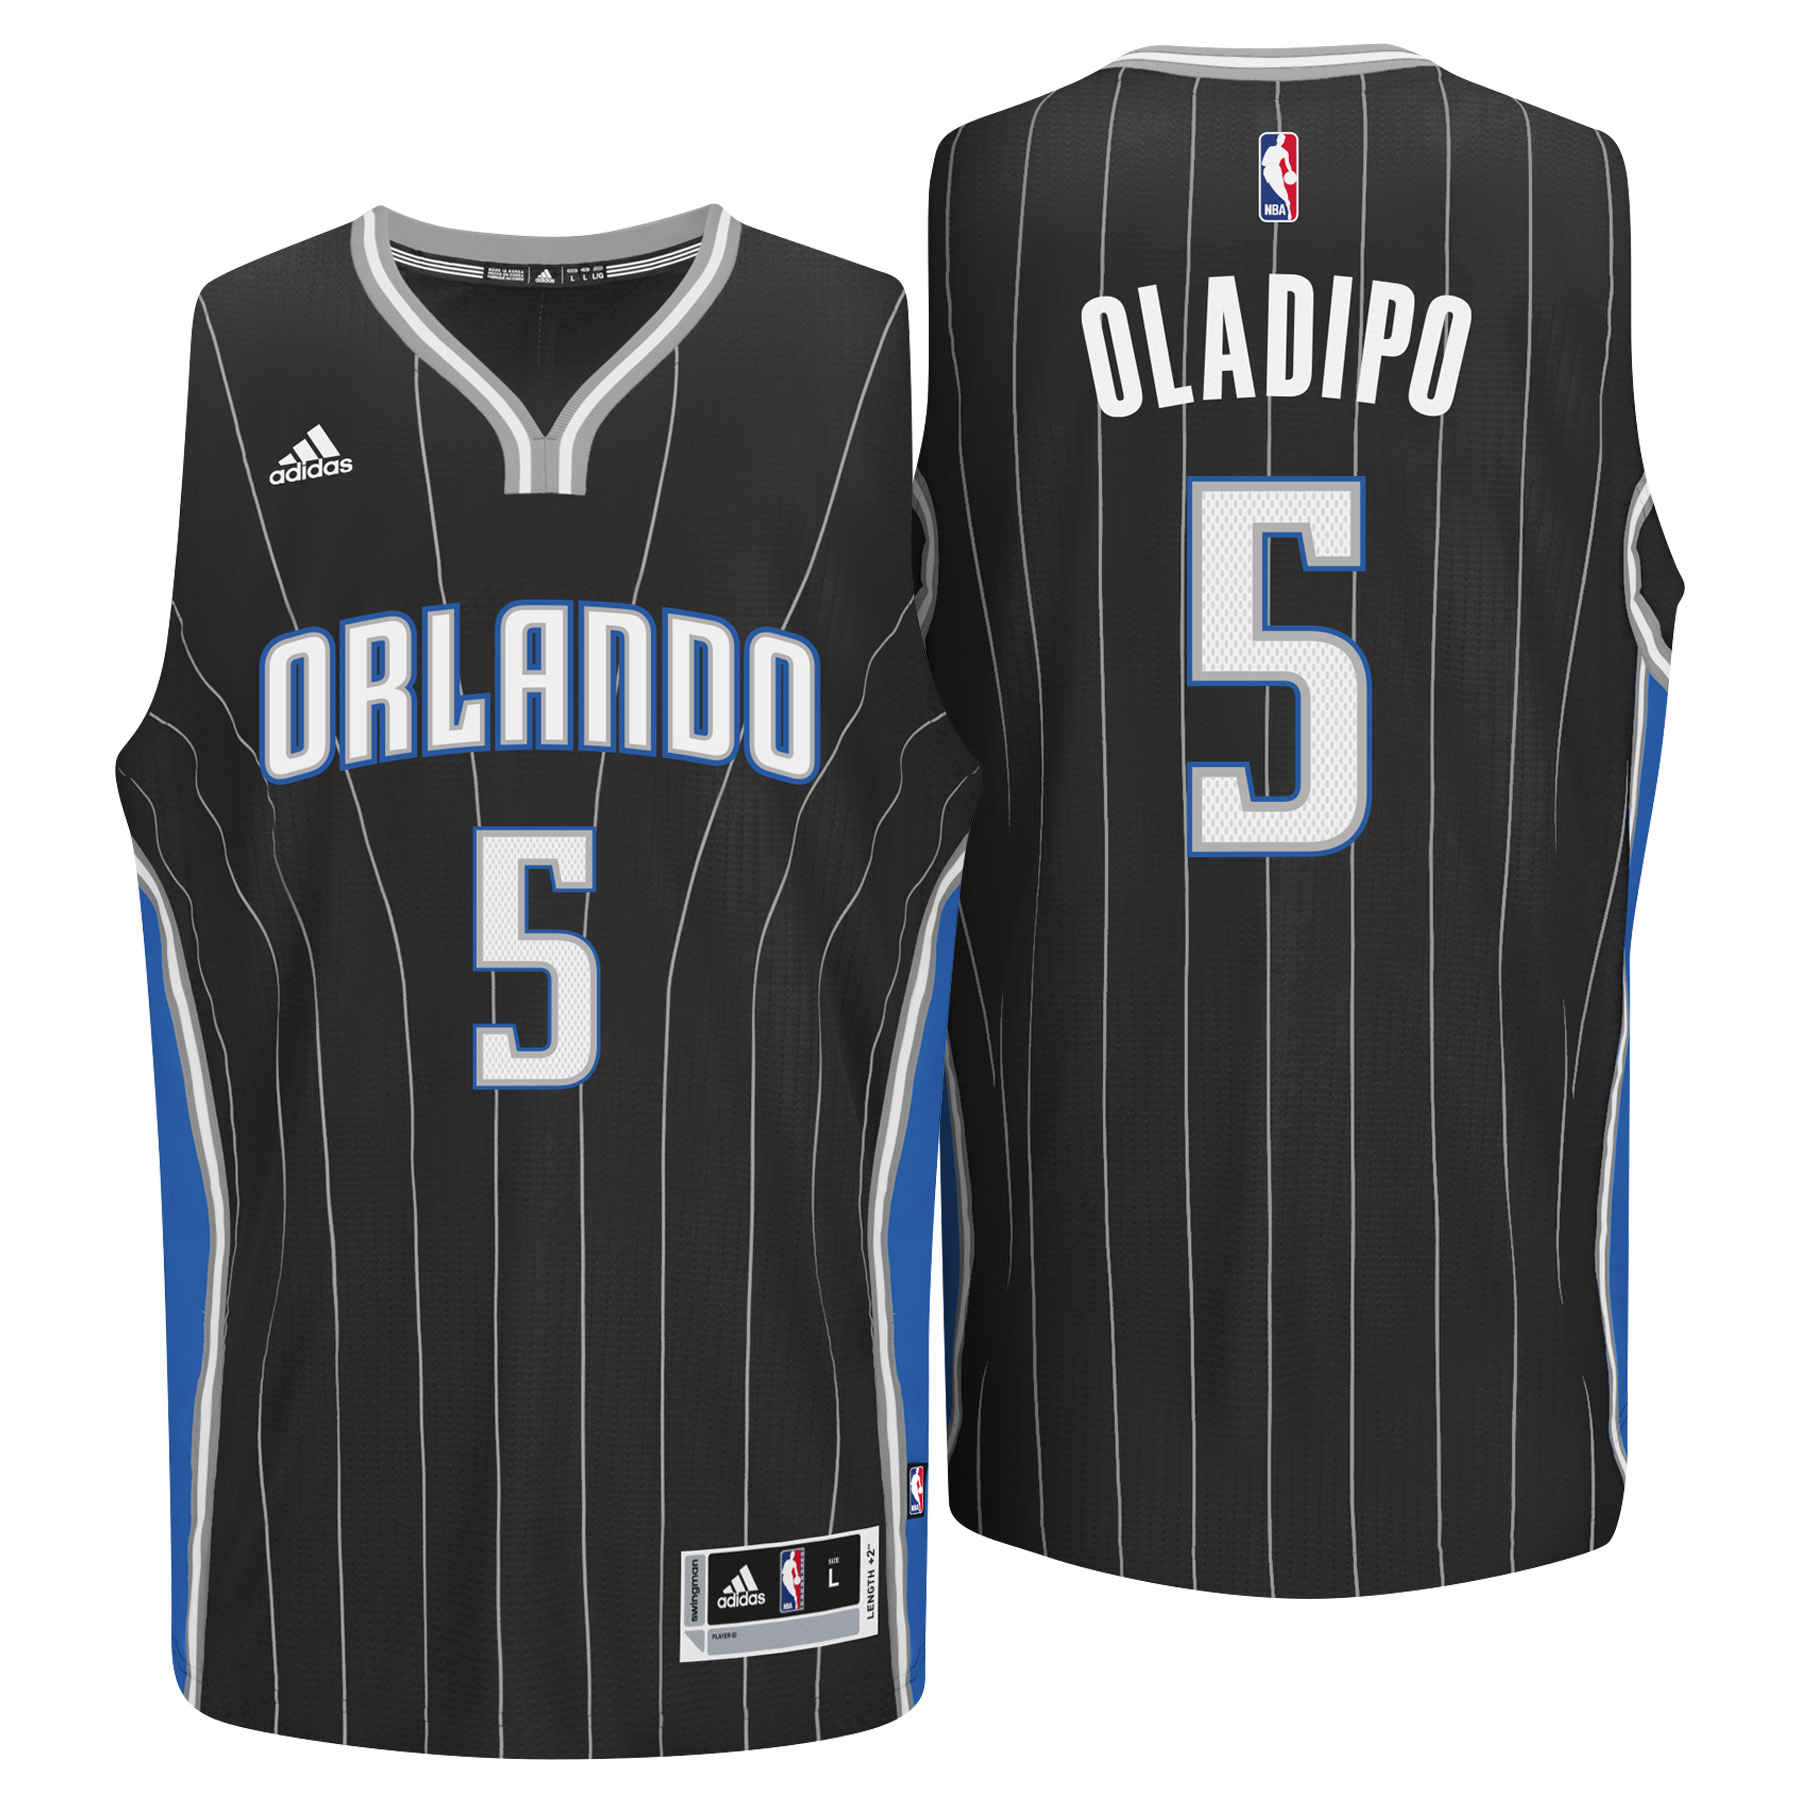 Orlando Magic Alternate Swingman Jersey - Victor Oladipo - Mens